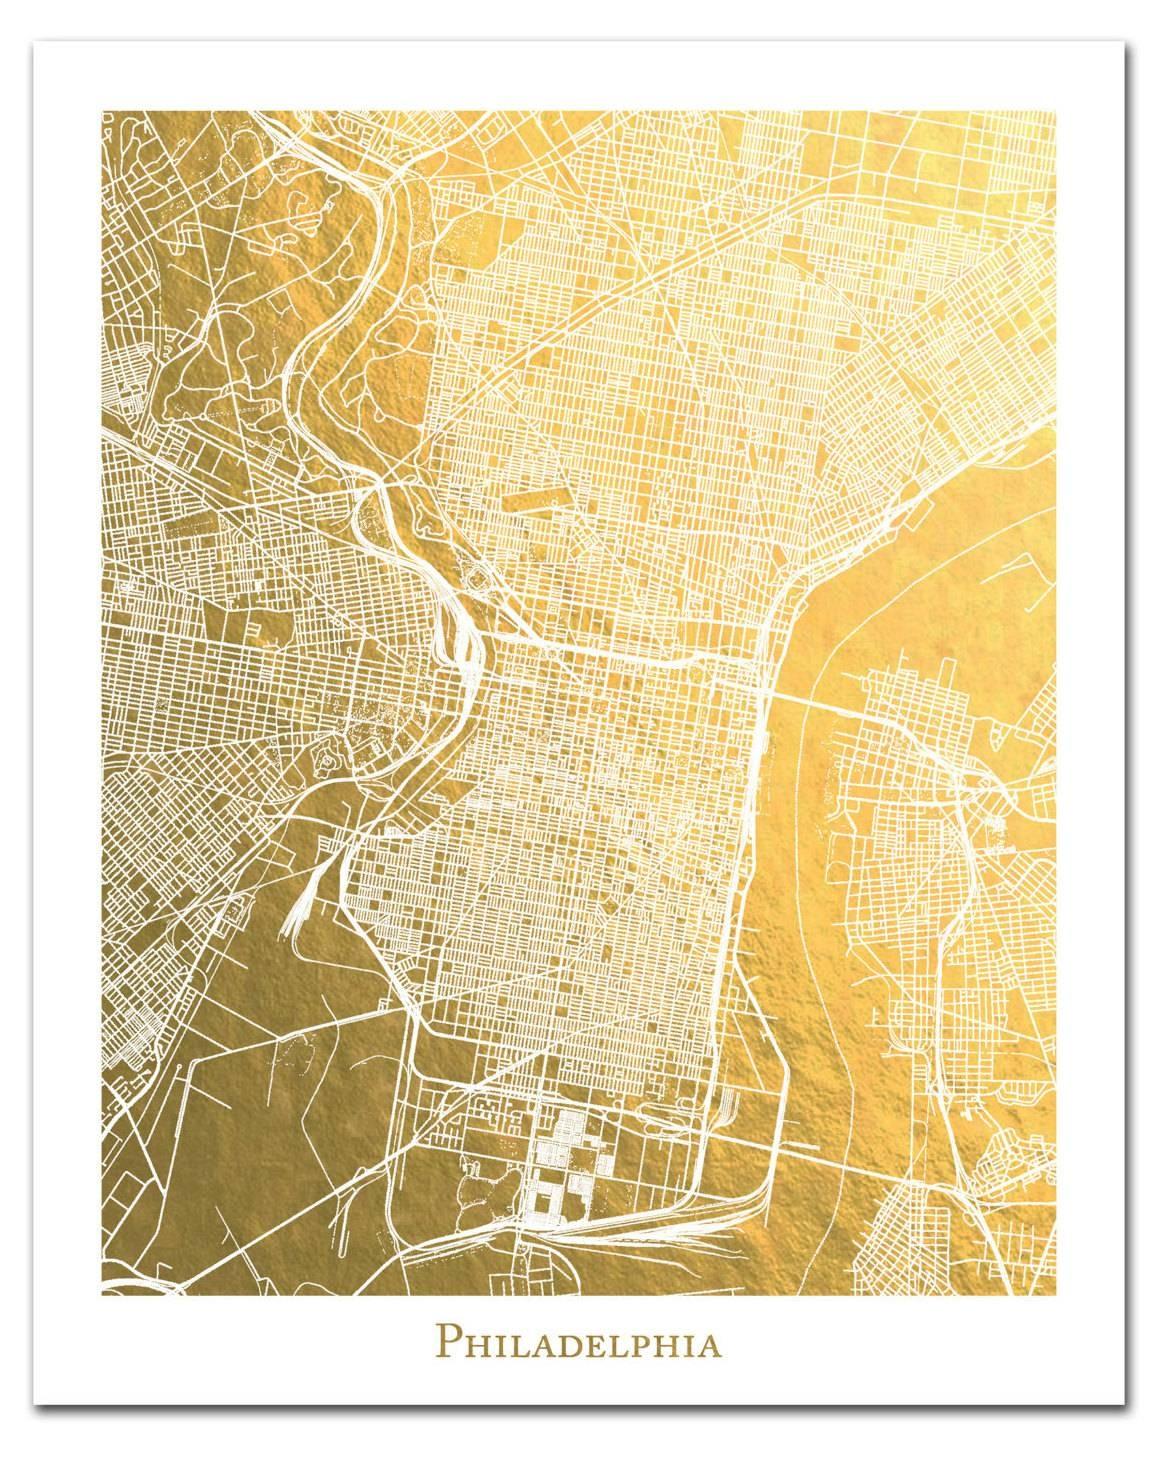 Philadelphia Map Philadelphia Gold Foil Map™ Print Gold Regarding Current Philadelphia Map Wall Art (View 10 of 20)